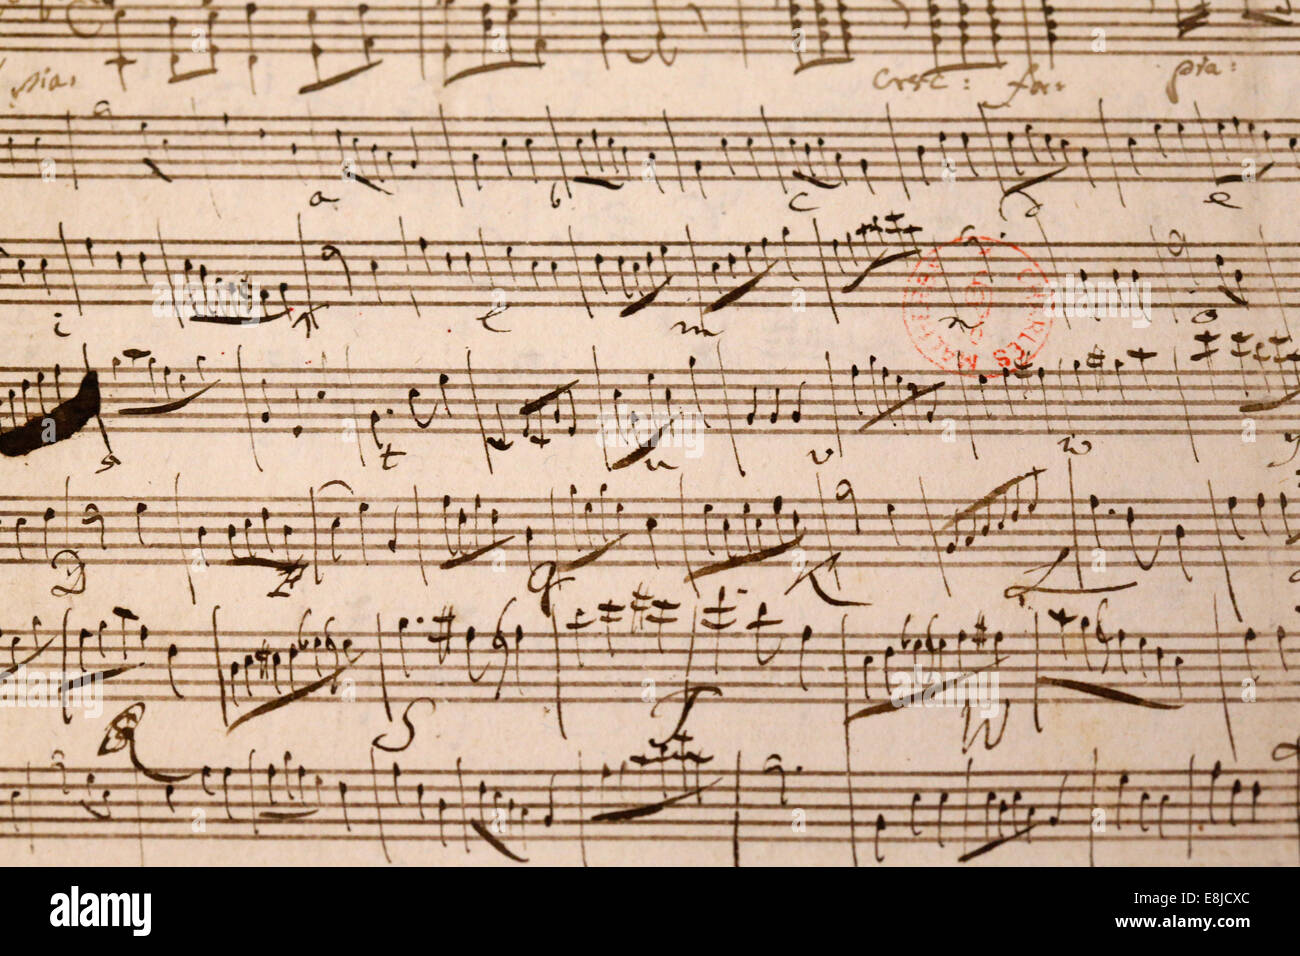 Music score. Wolfgang Amadeus Mozart Stock Photo: 74164004 ... Wolfgang Amadeus Mozart Musical